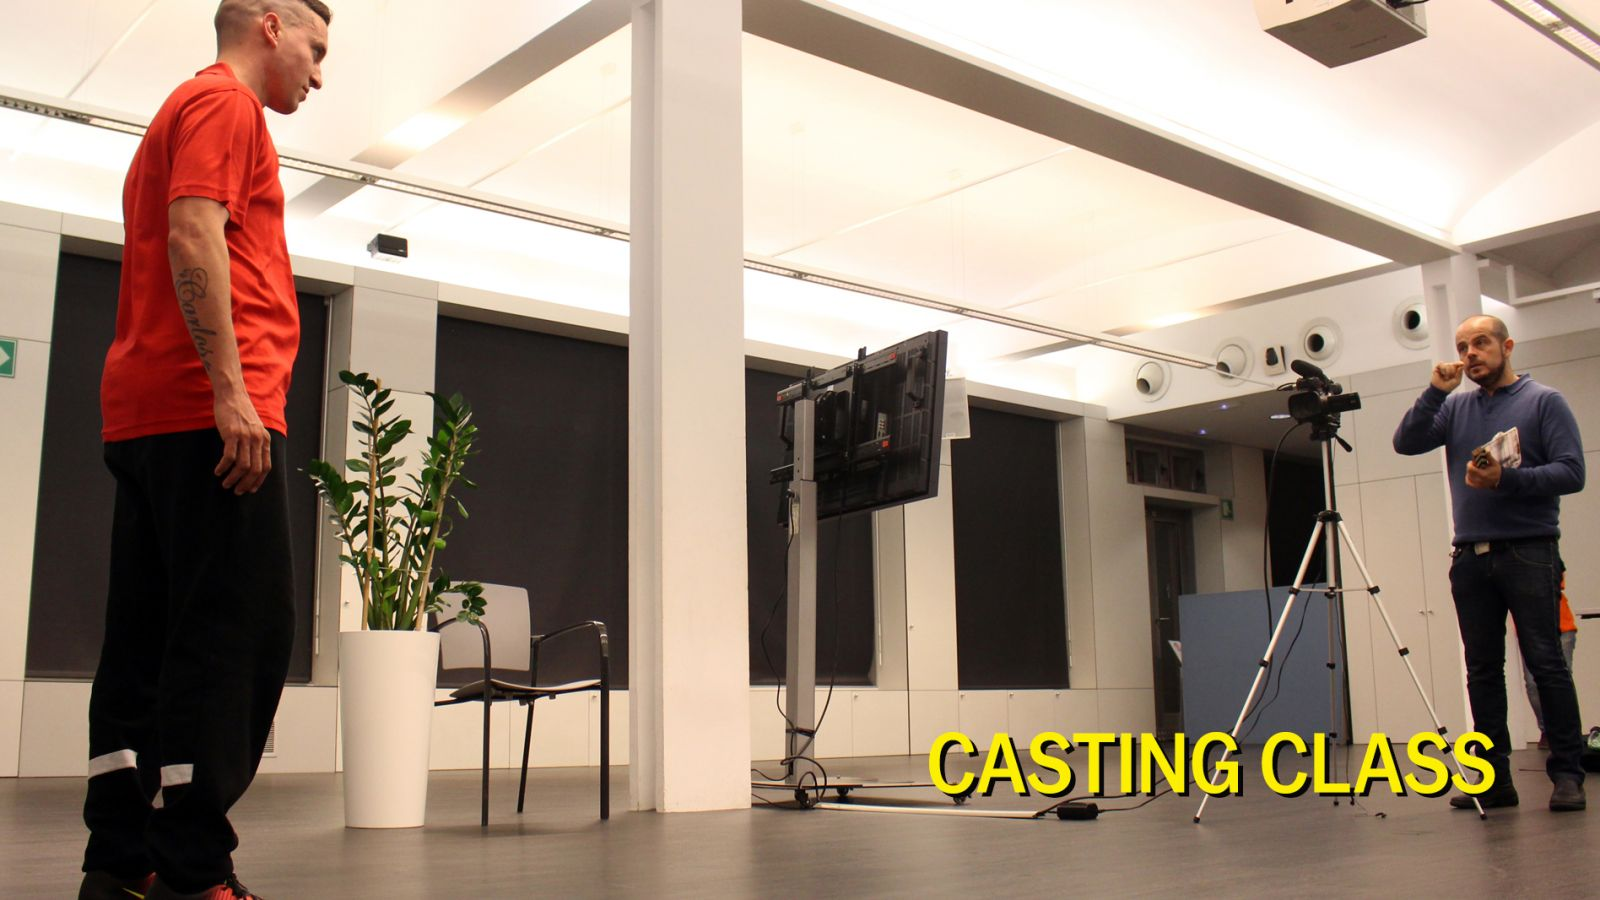 Casting class